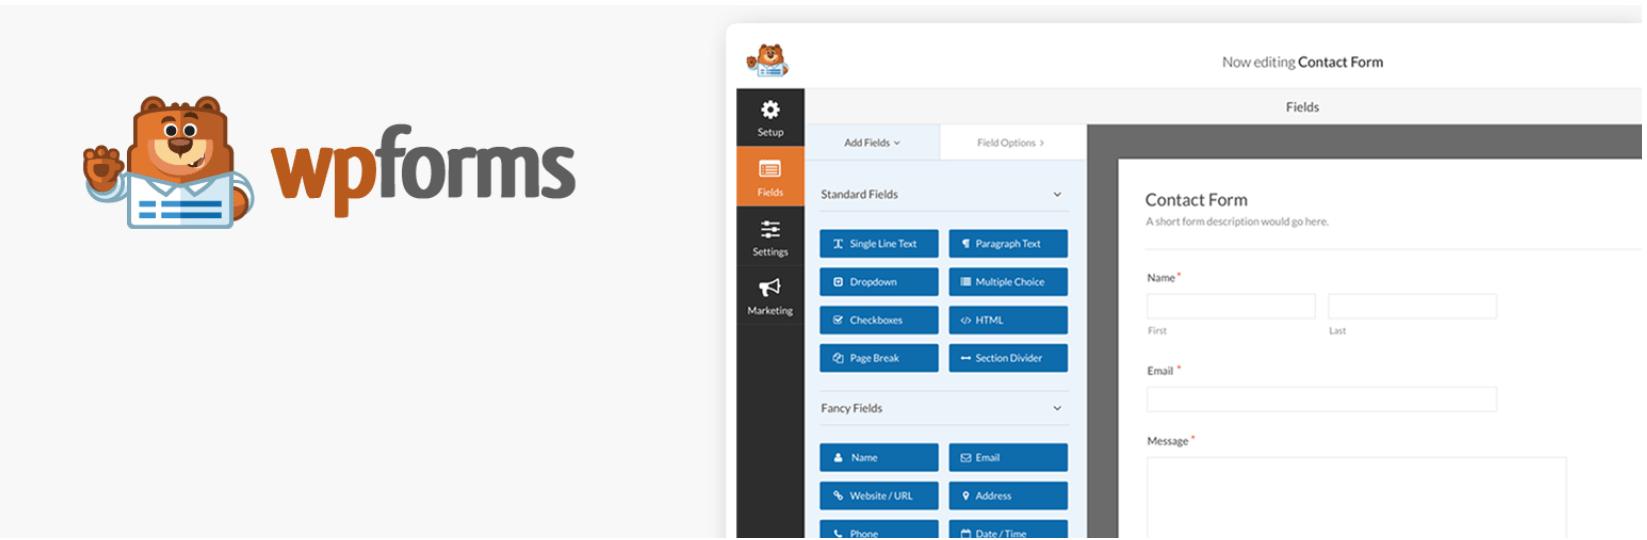 wpforms is a WordPress plugin for business websites